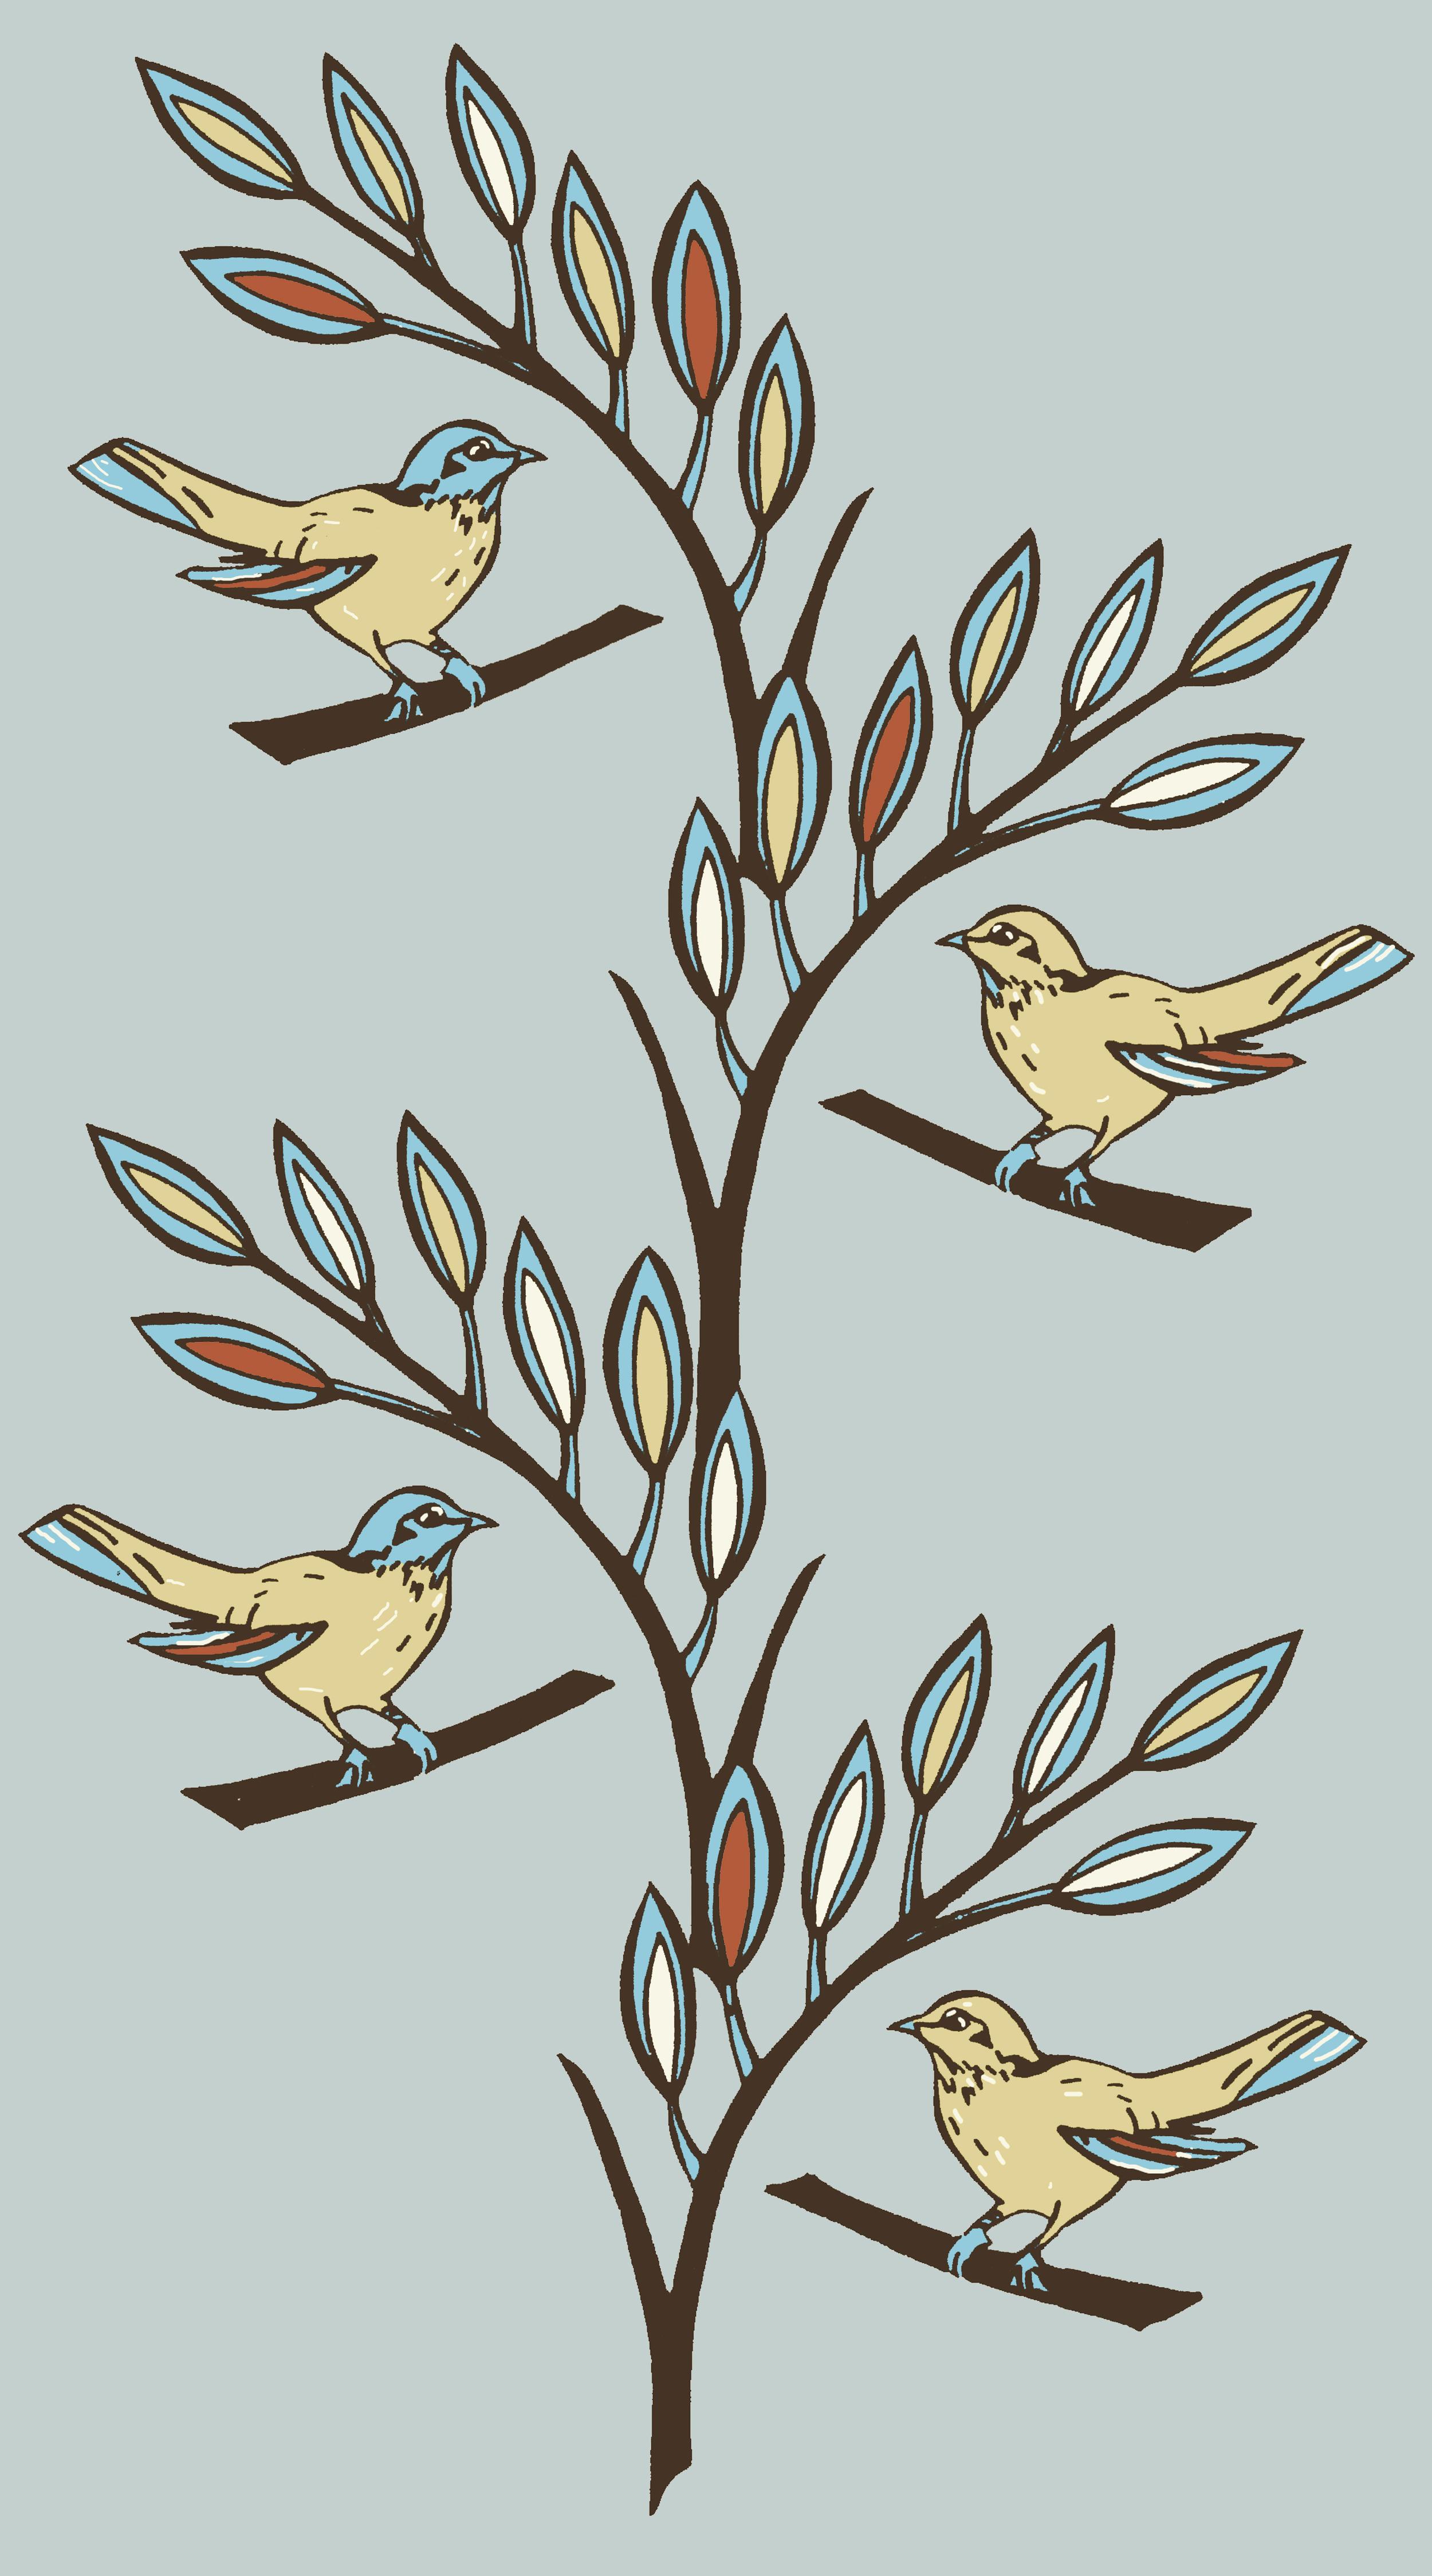 Birds on a branch design